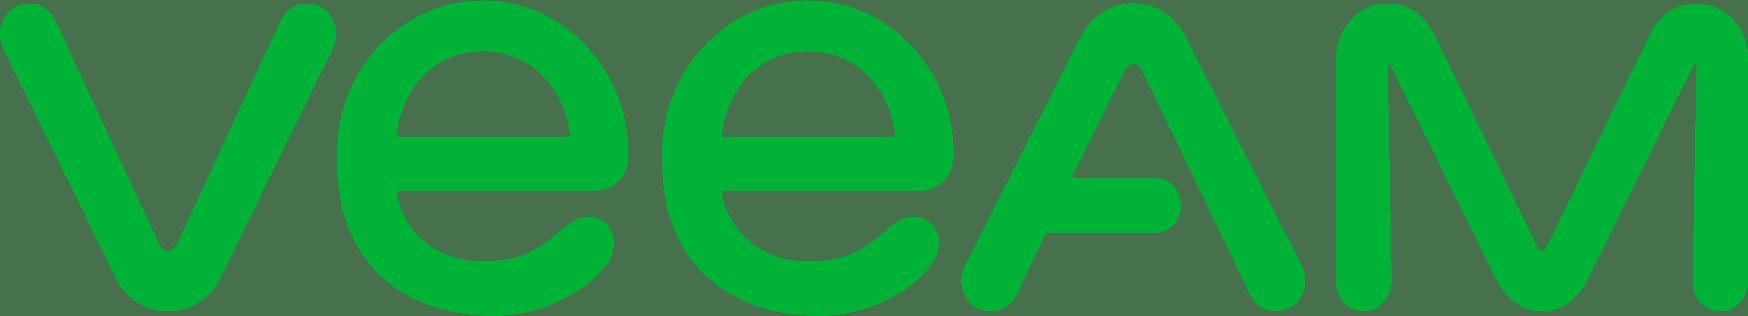 The logo for Veeam Software.